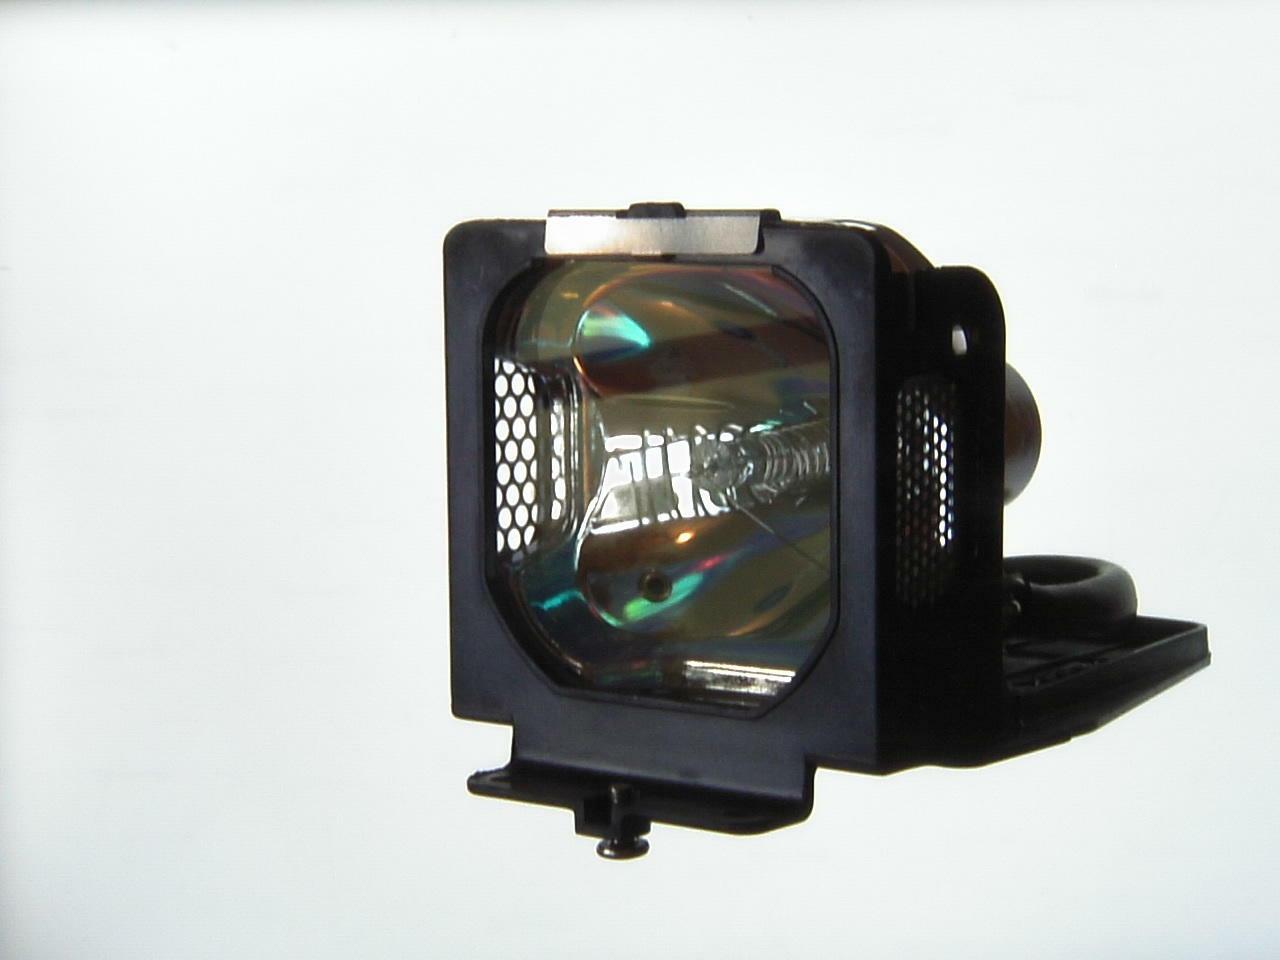 <b>Hybrid Brand</b> CHRISTIE VIVID LX25   (Black connector) replacement lamp - 180 Day Warranty